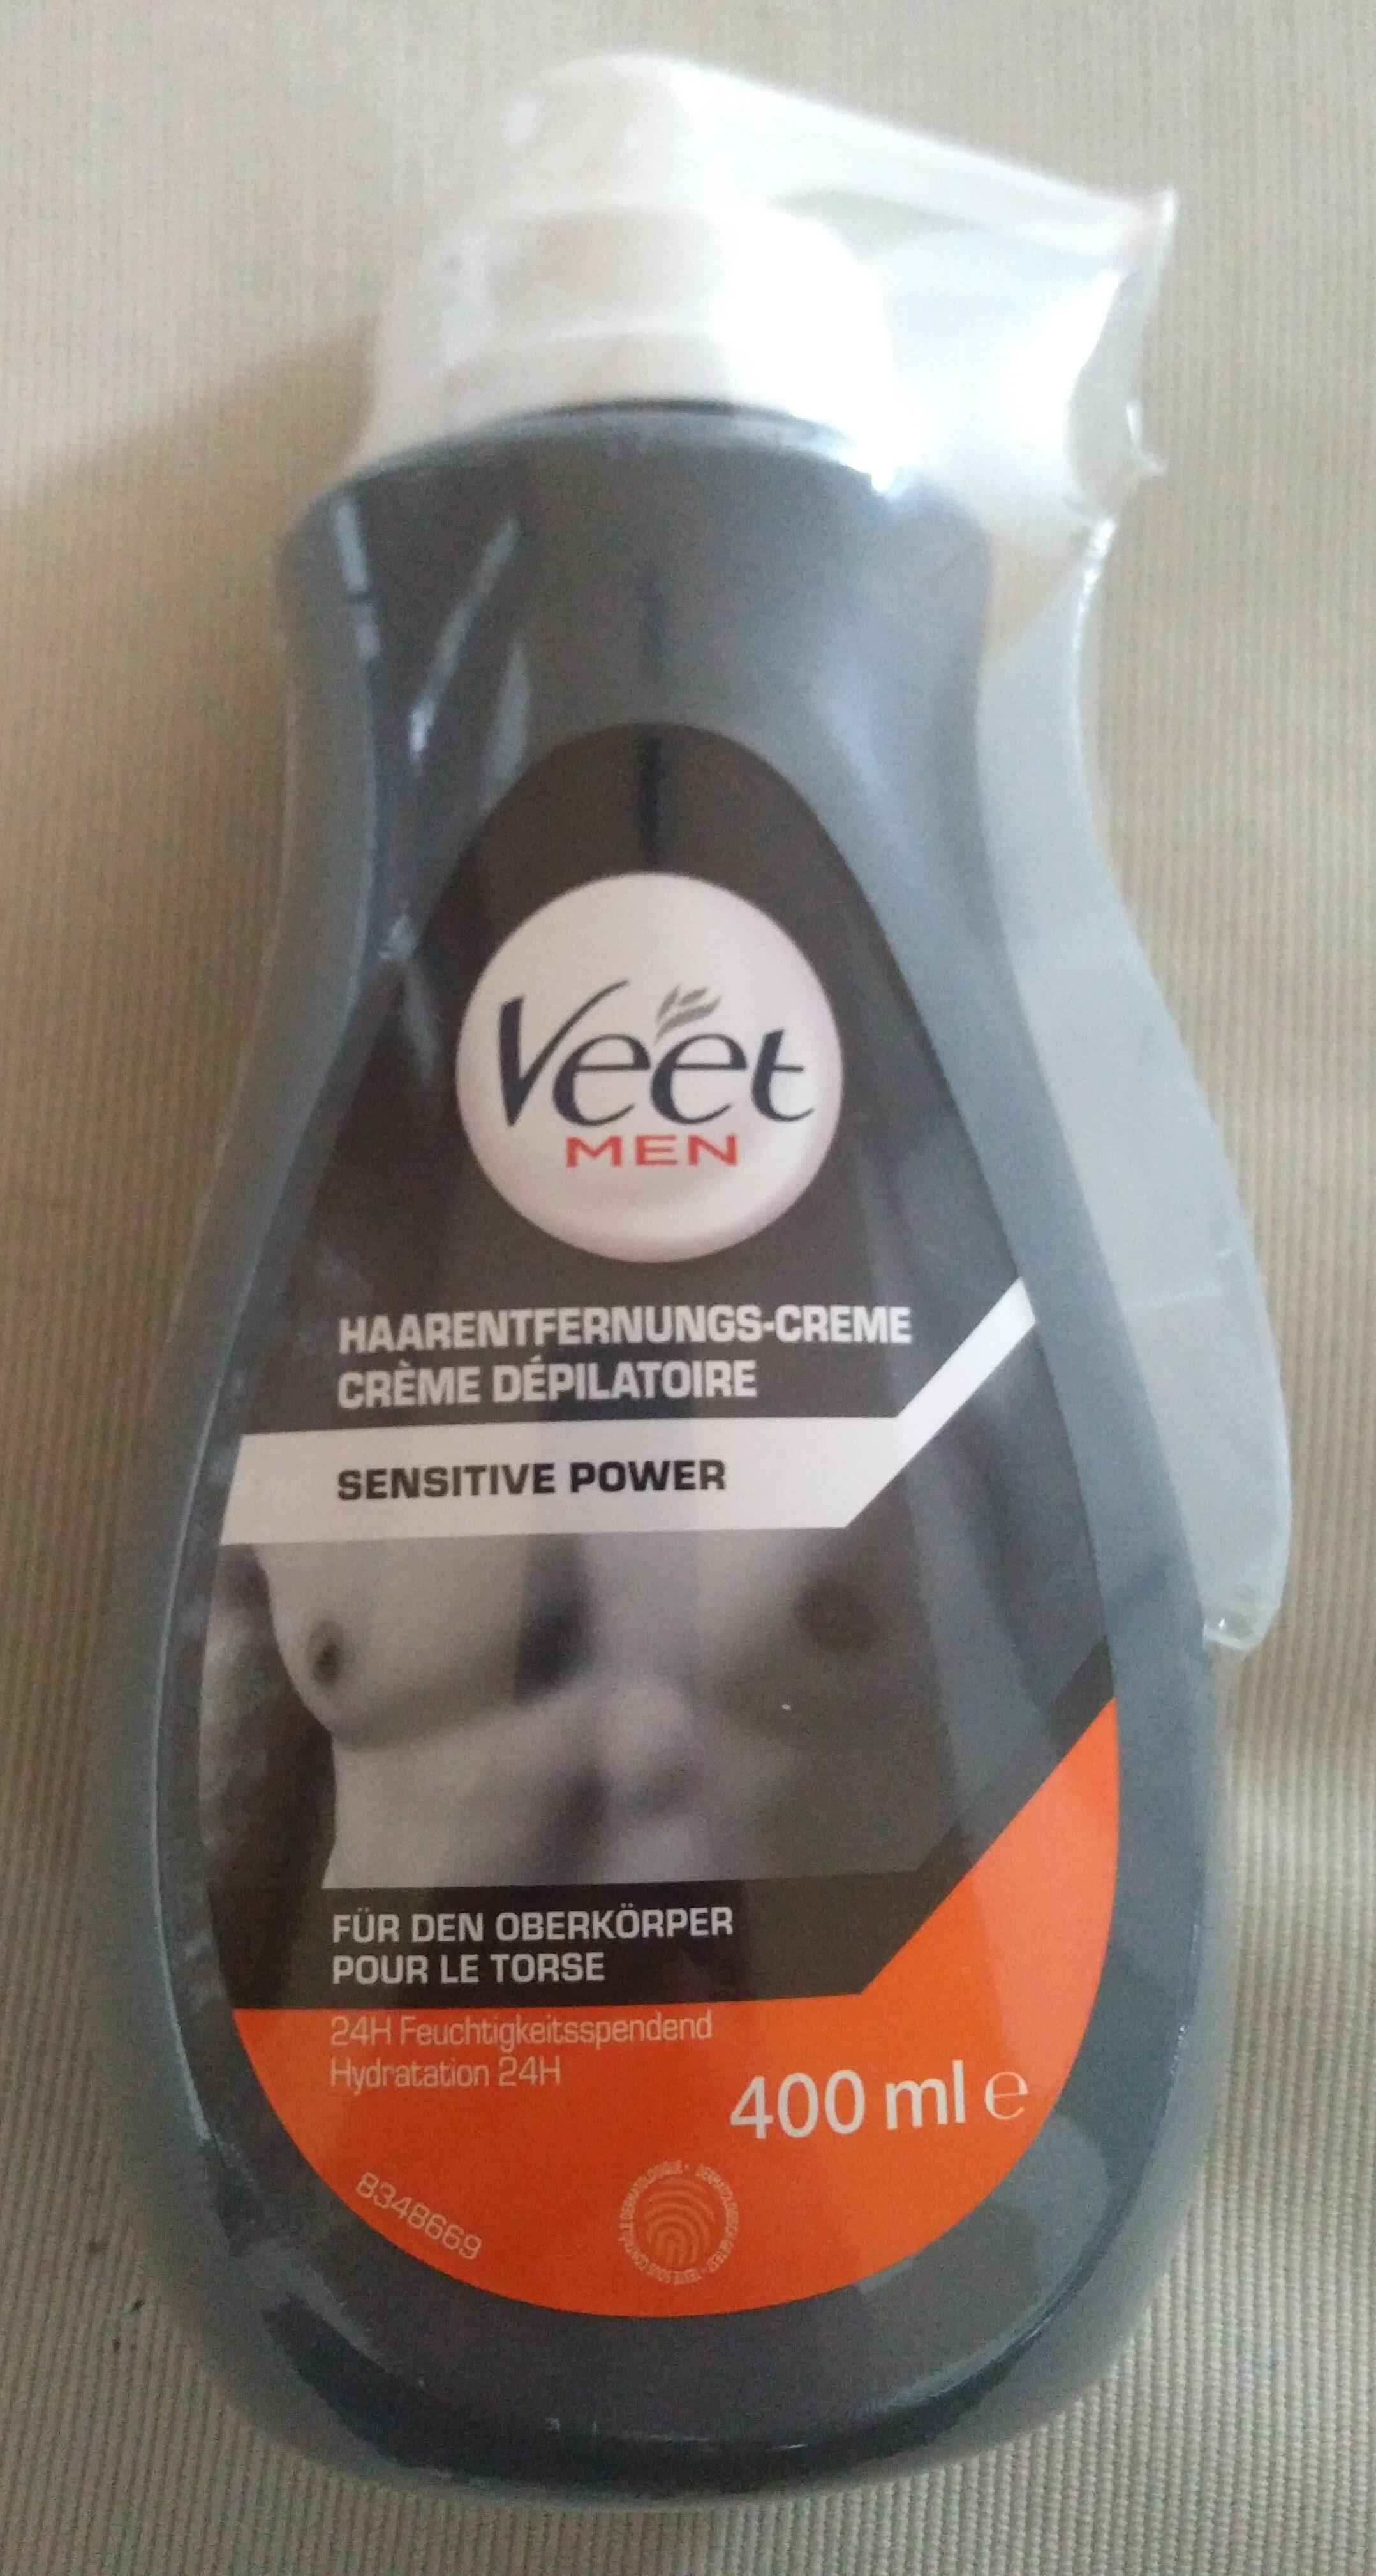 Haarentfernungs-Creme Sensitive Power - Produit - de